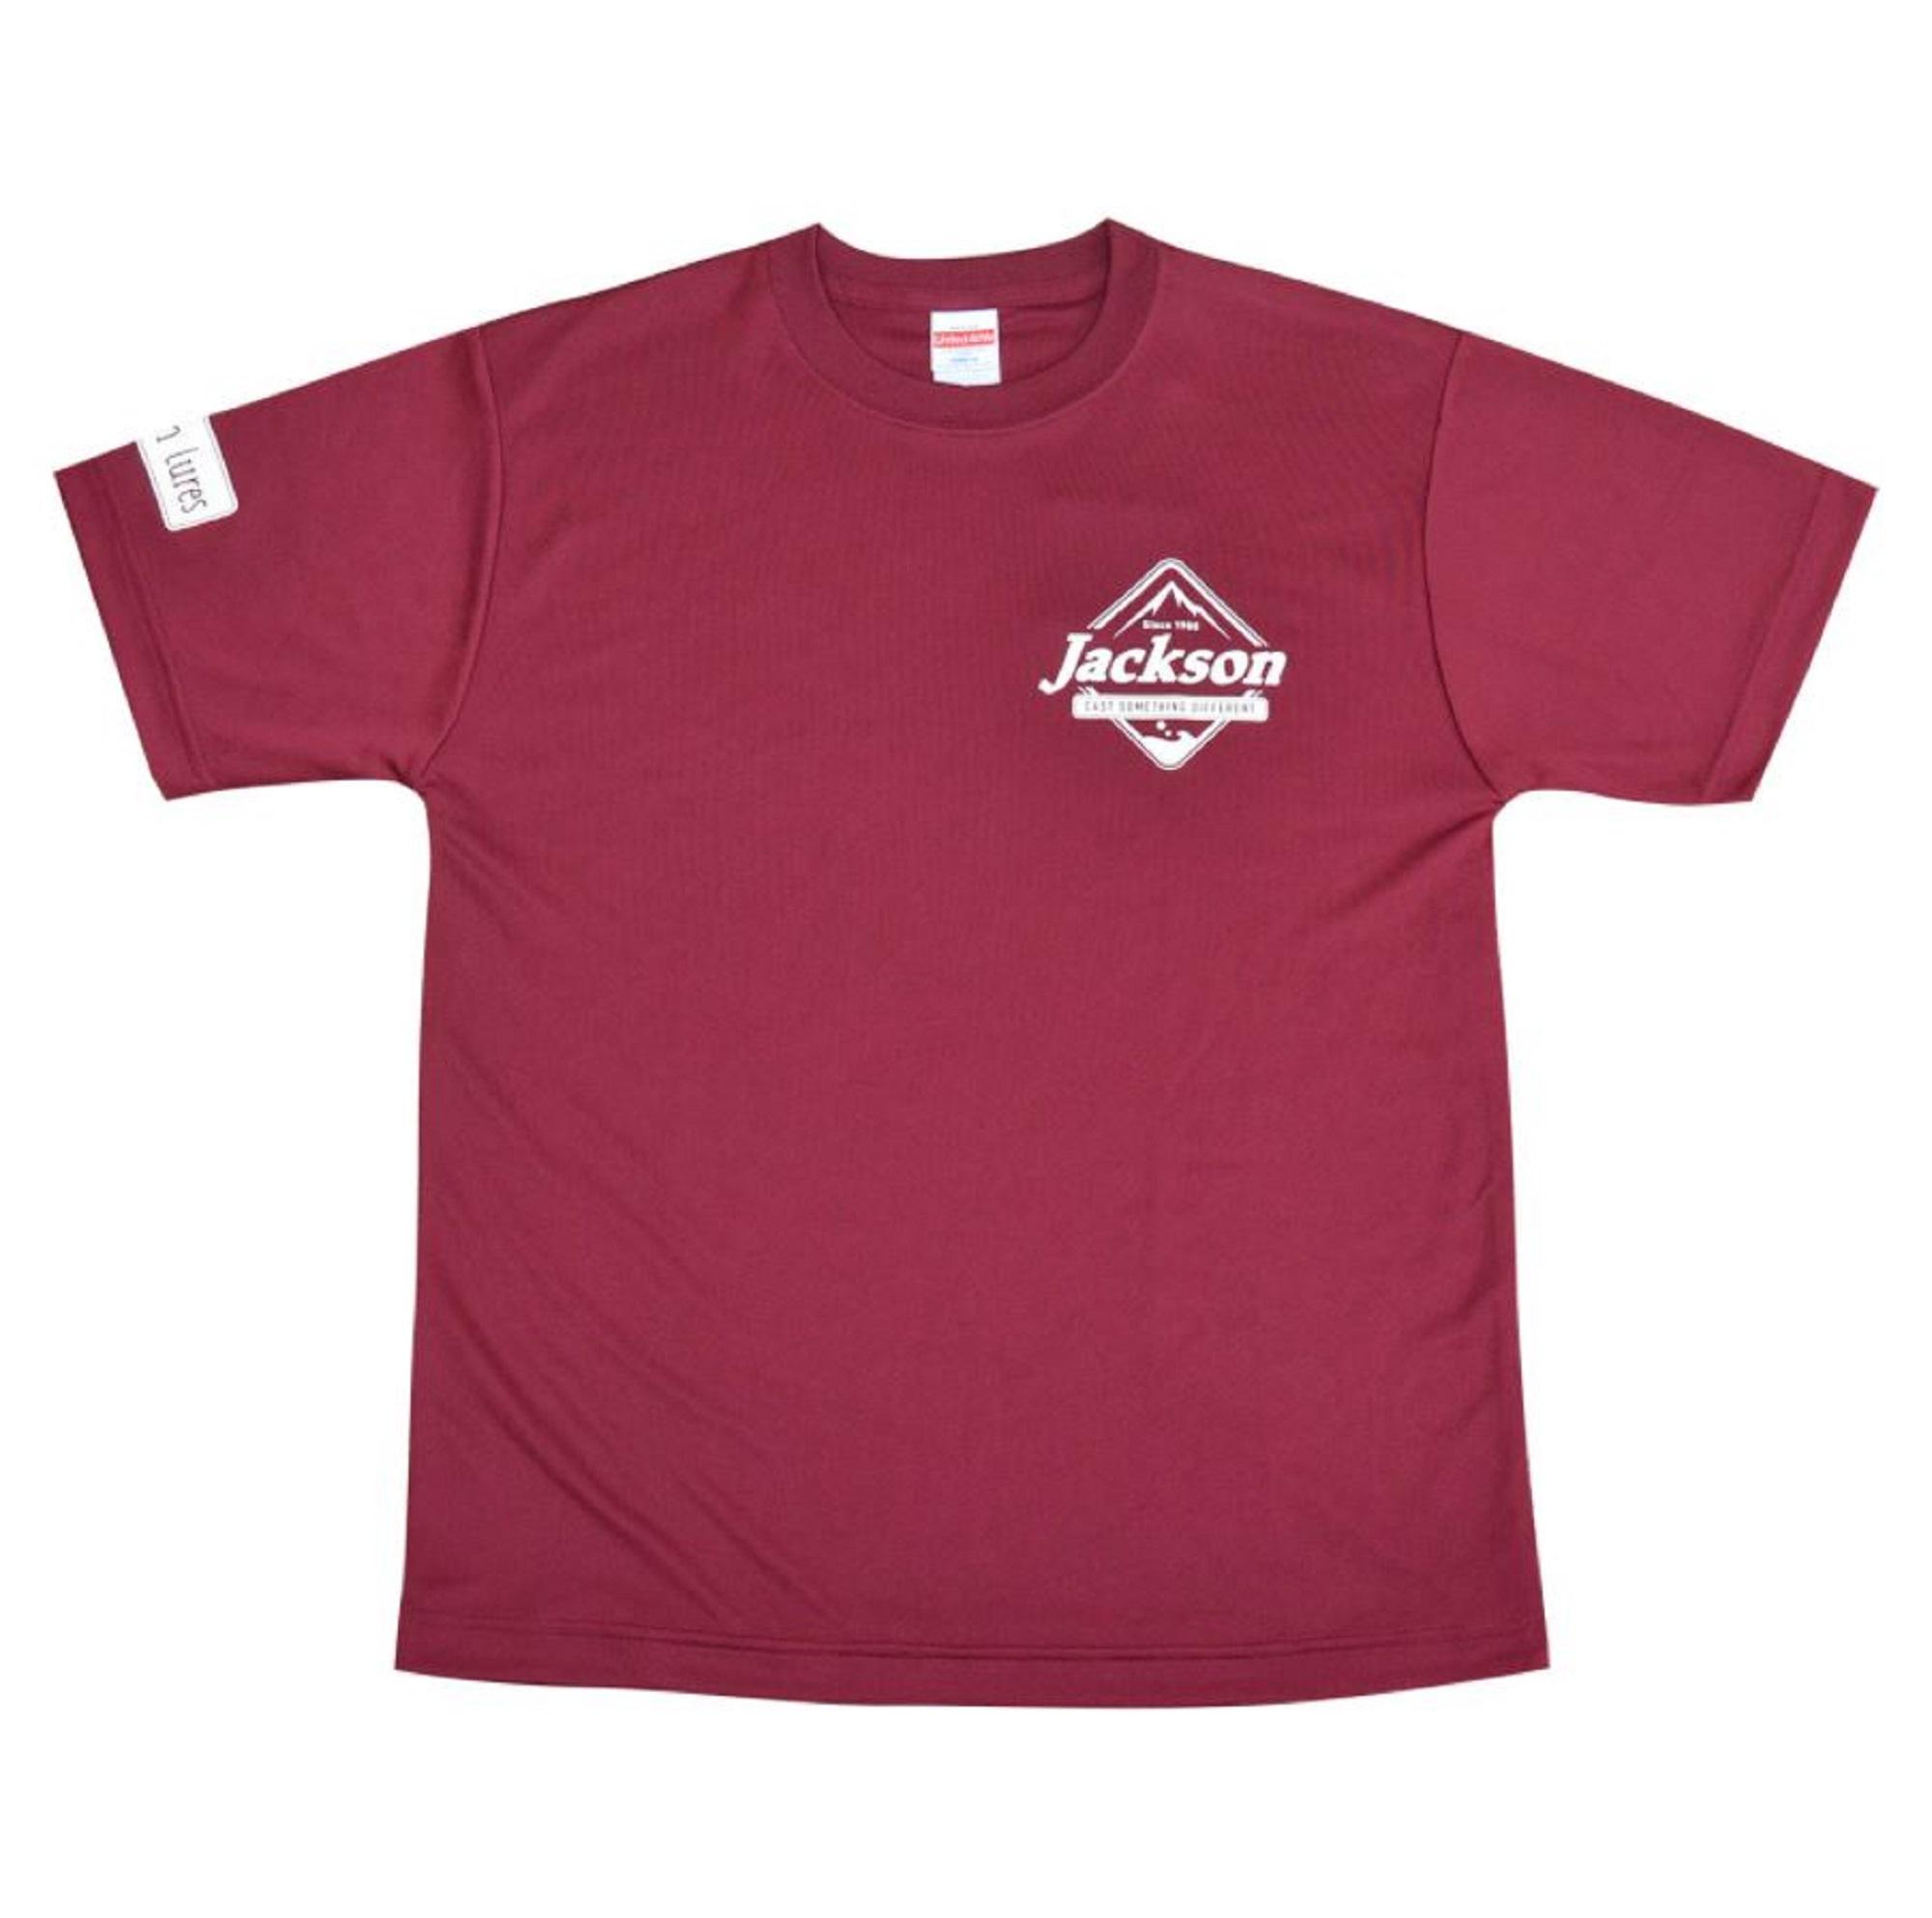 Jackson T-shirt Silky Touch Tee Burgundy L (9144)